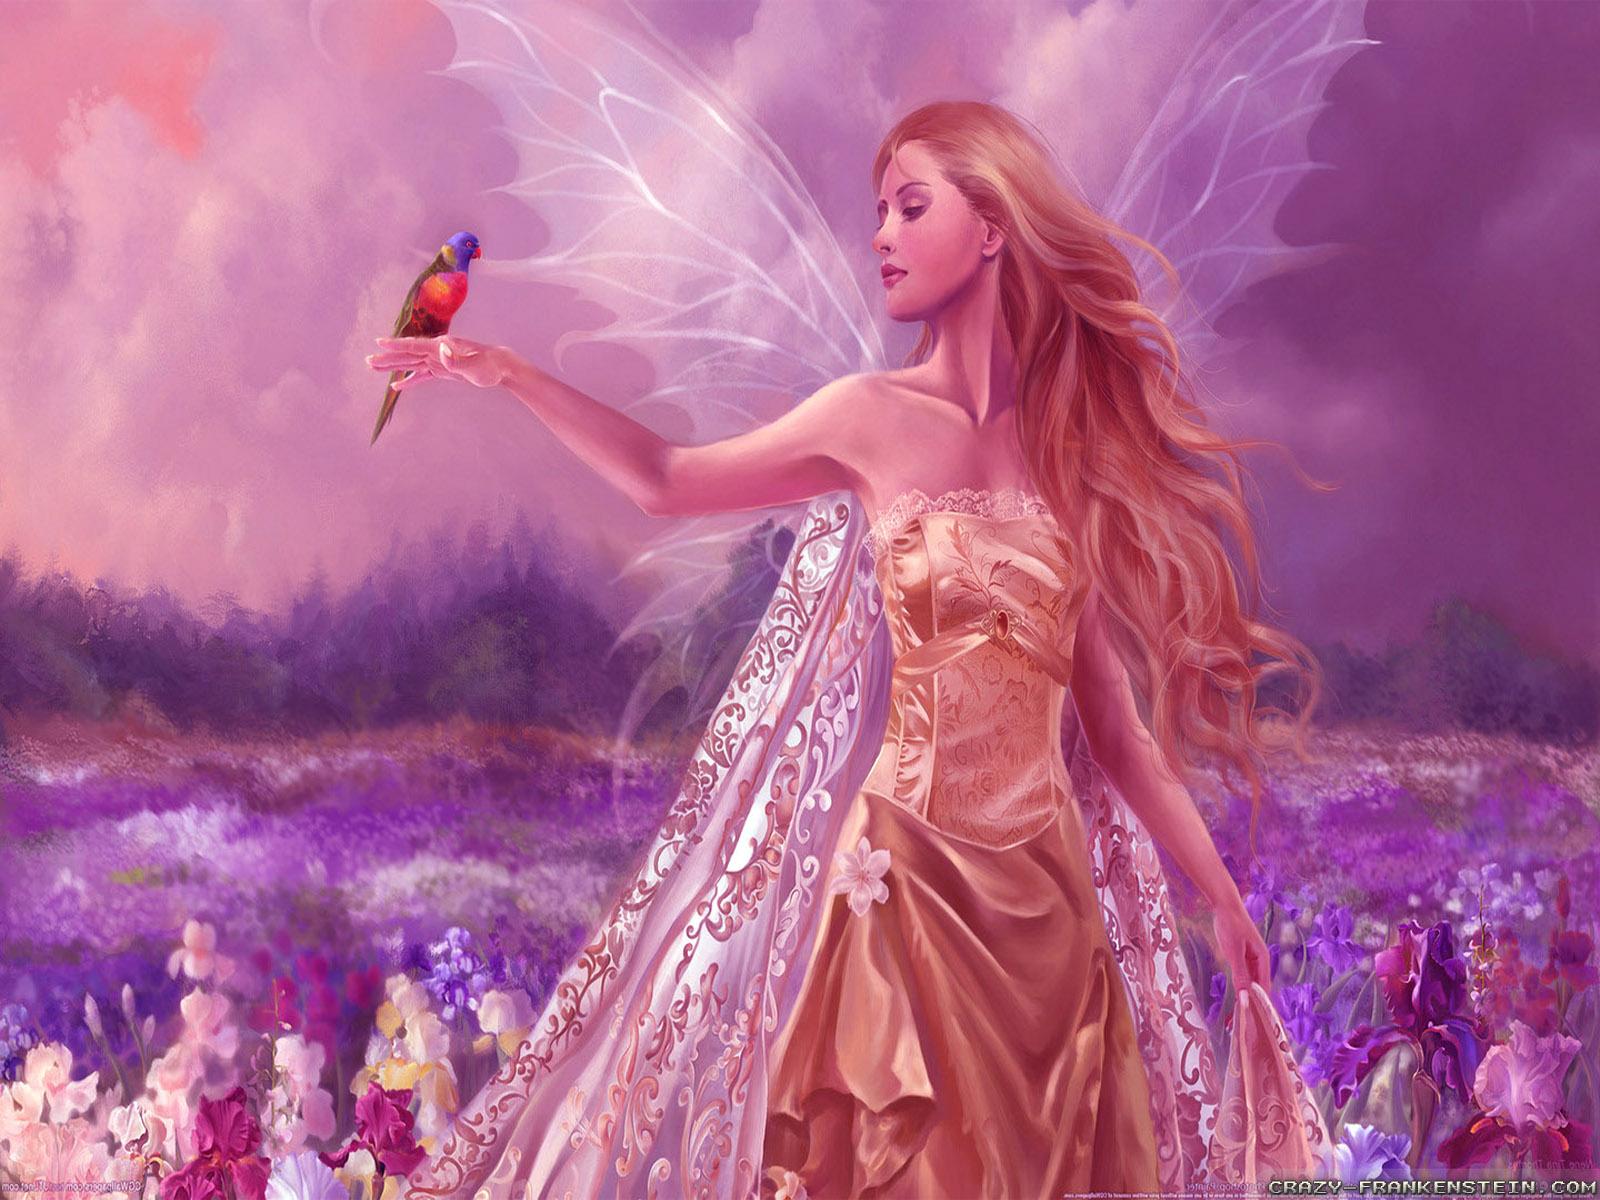 beautiful angel and bird animal hd wallpaper widescreen